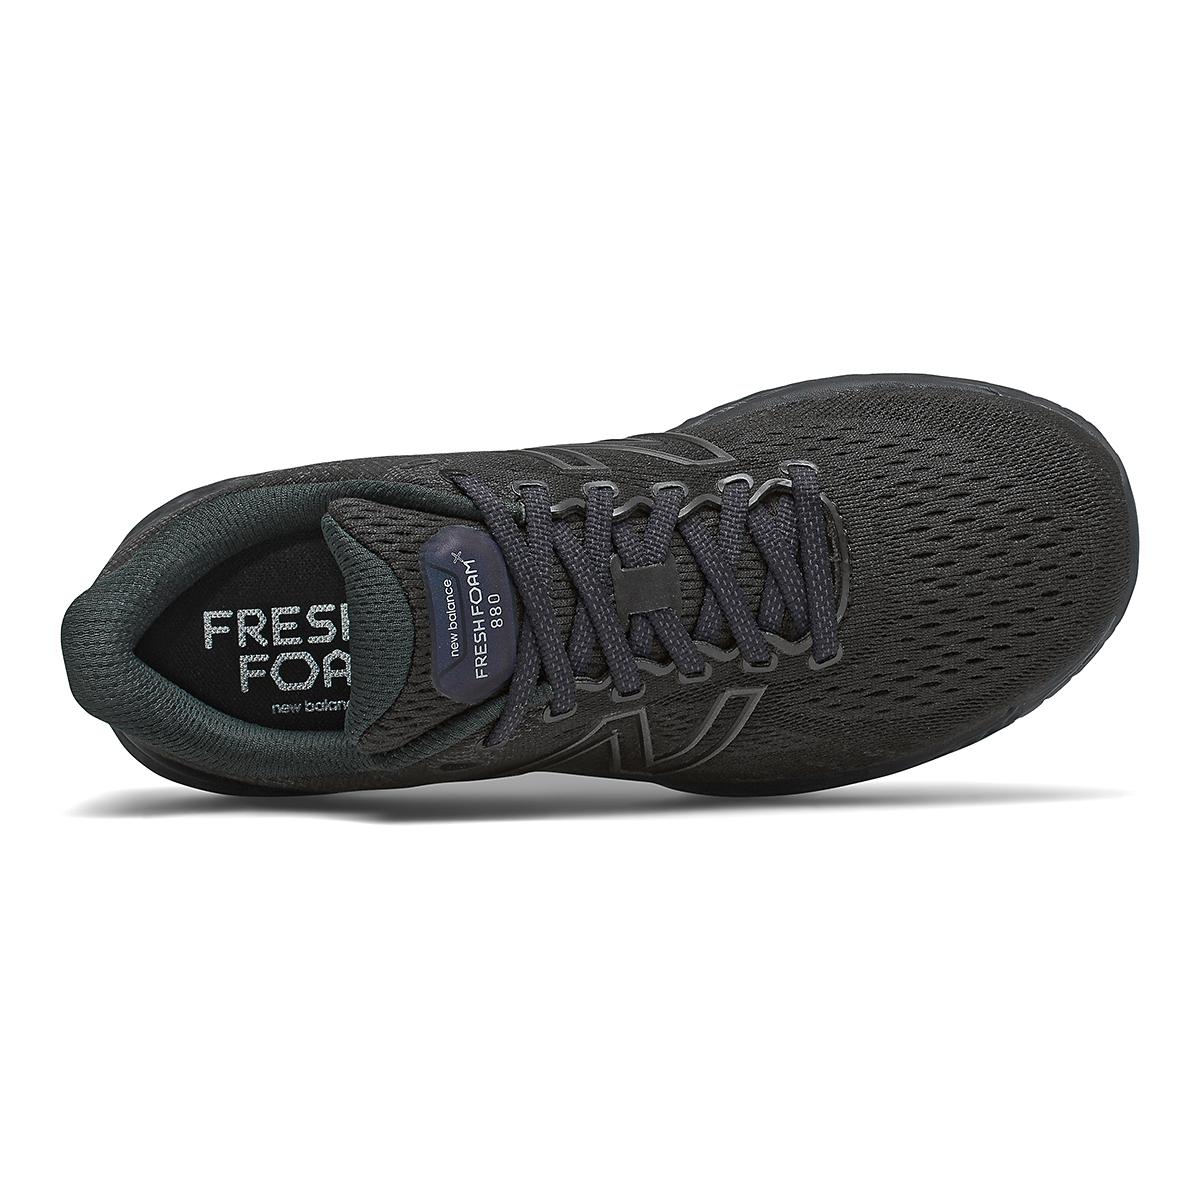 Women's New Balance 880V11 Running Shoe - Color: Black/Phantom - Size: 5 - Width: Narrow, Black/Phantom, large, image 3